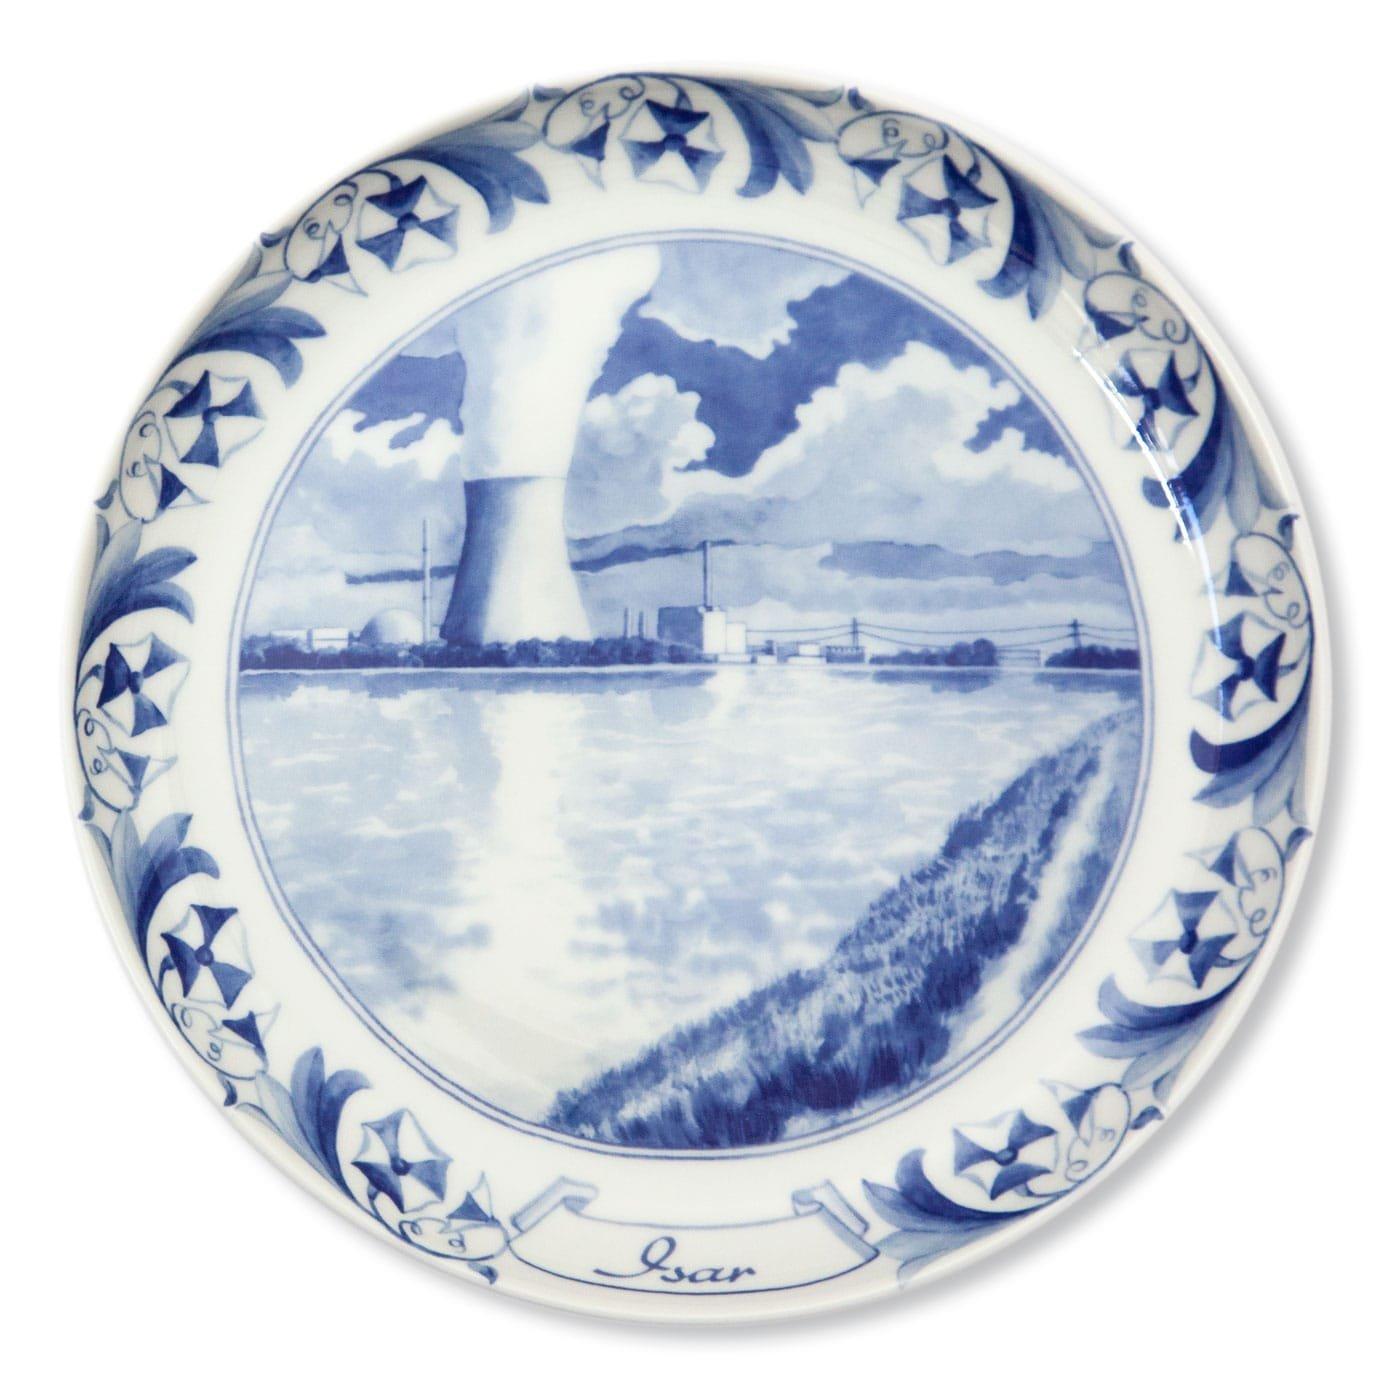 porcelain-nuclear-reactors-plates-isar